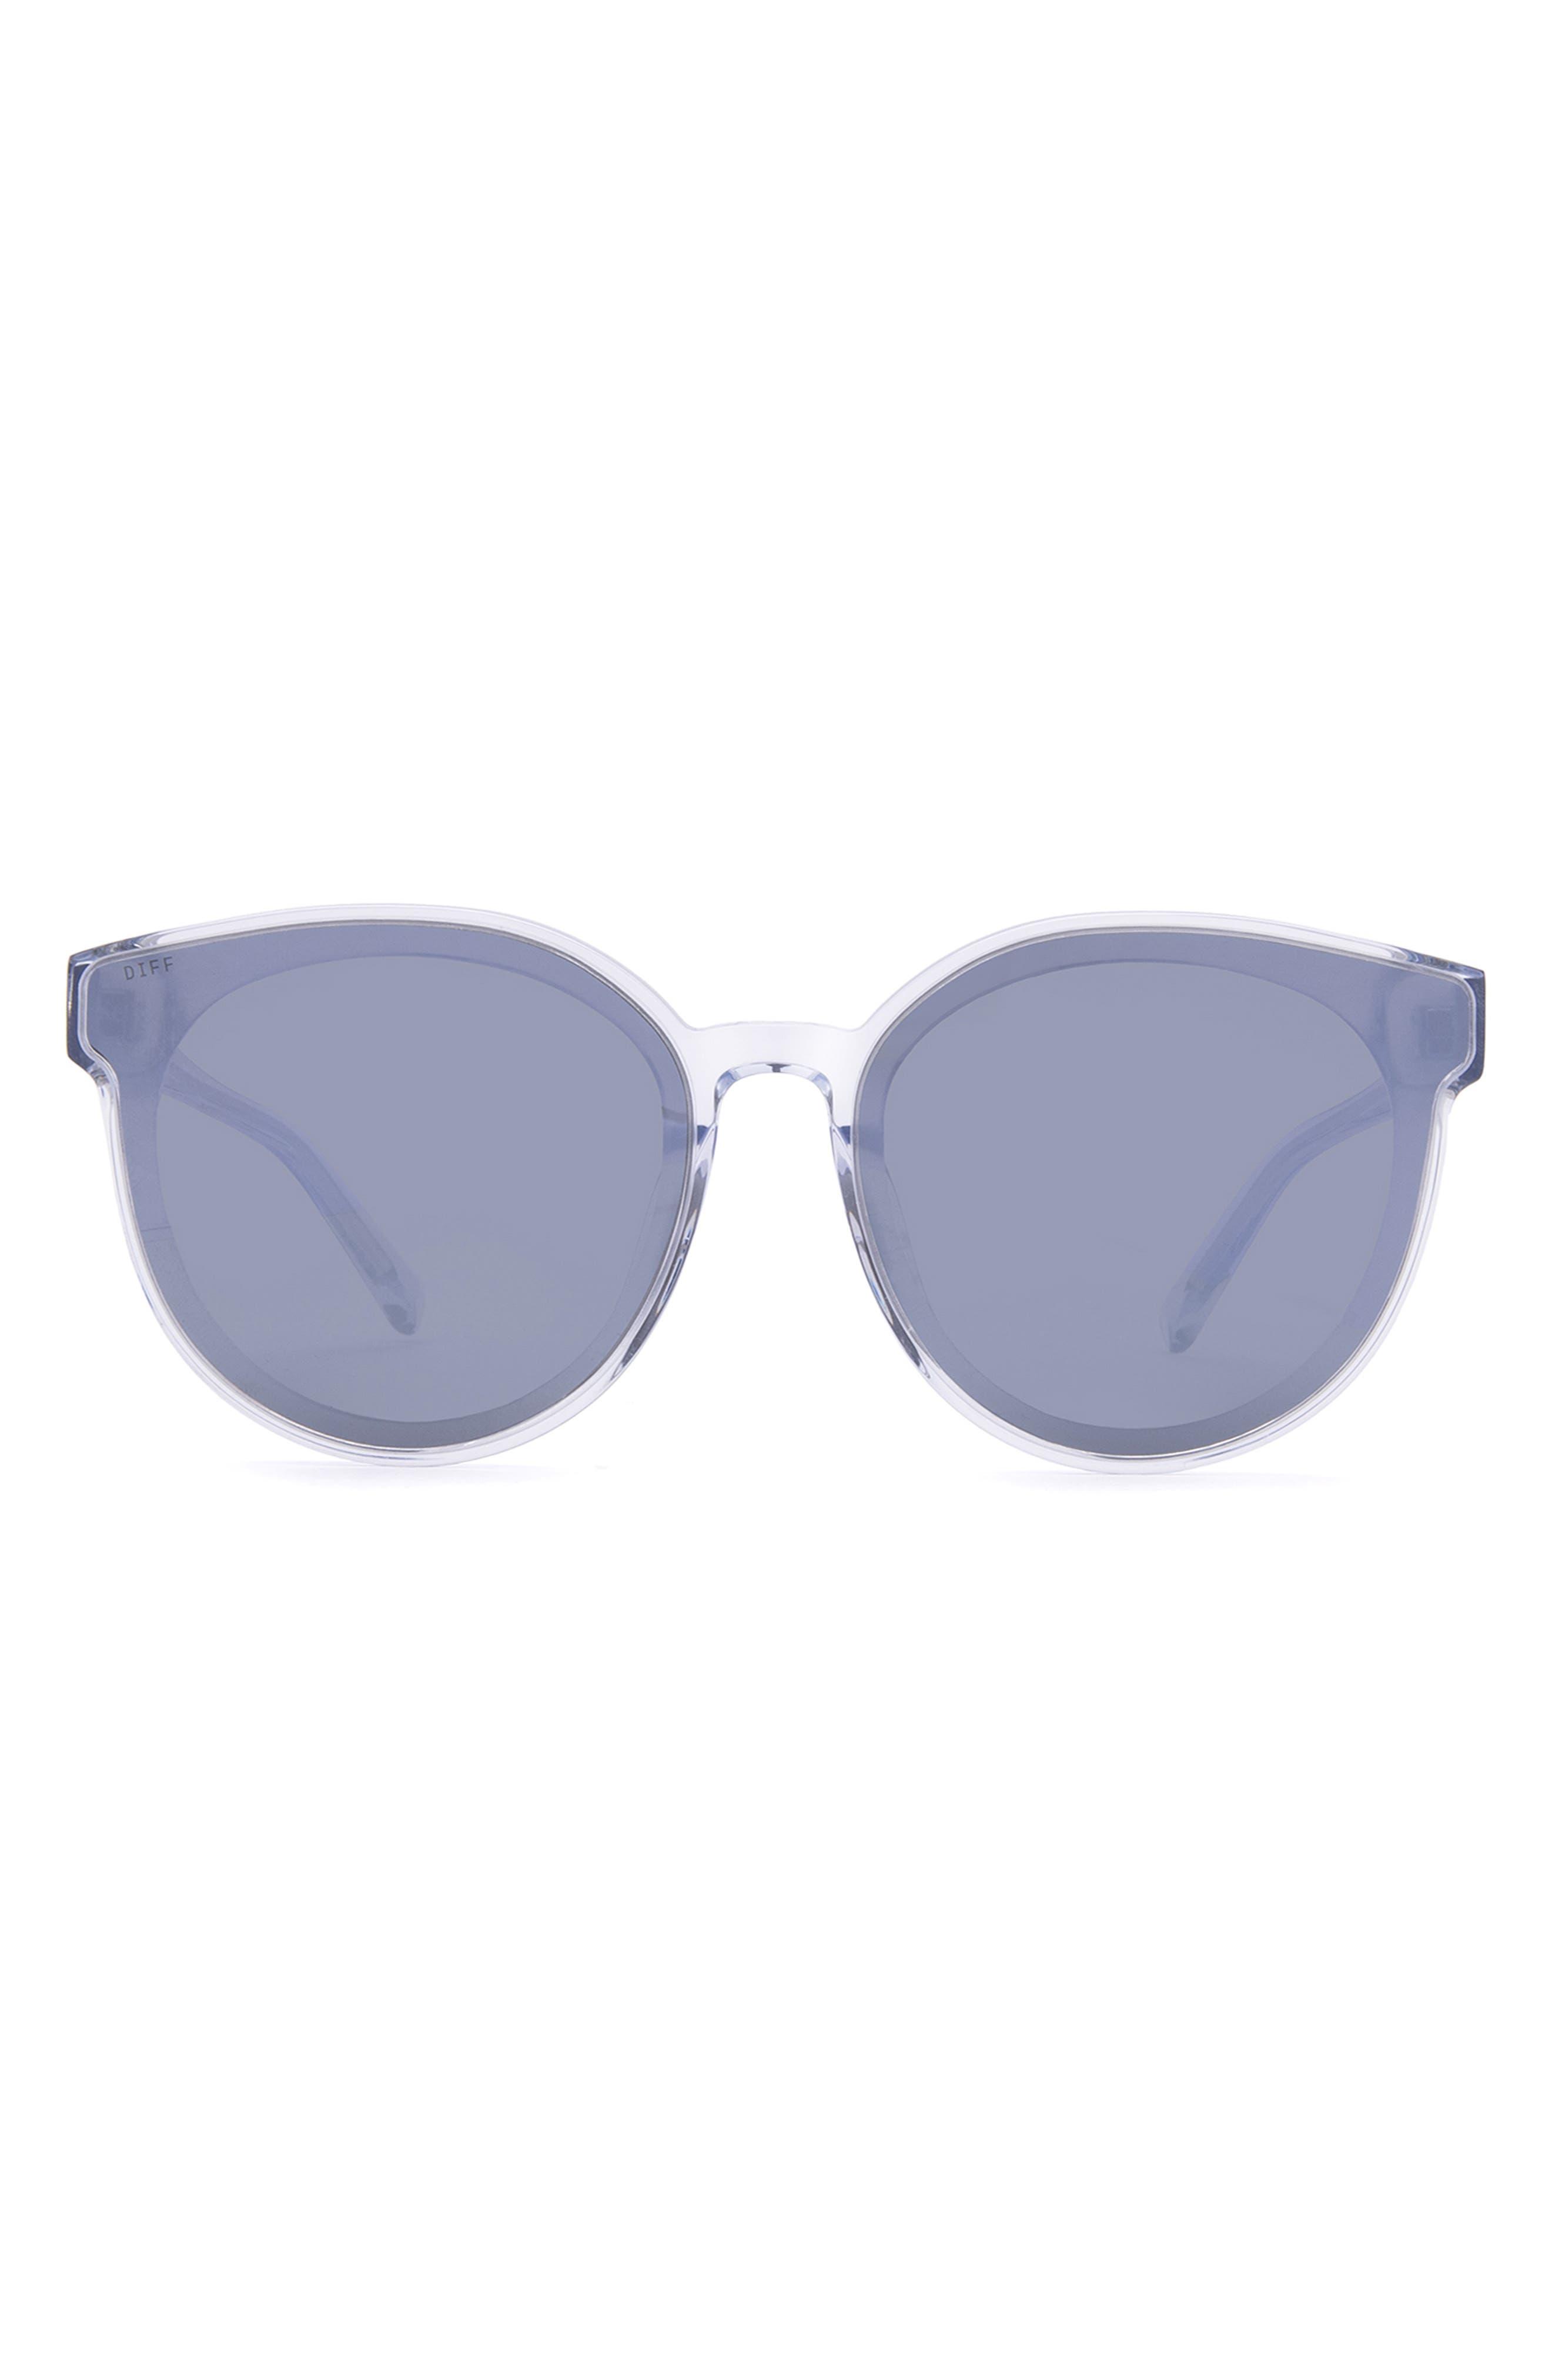 Gemma 67mm Oversize Round Sunglasses